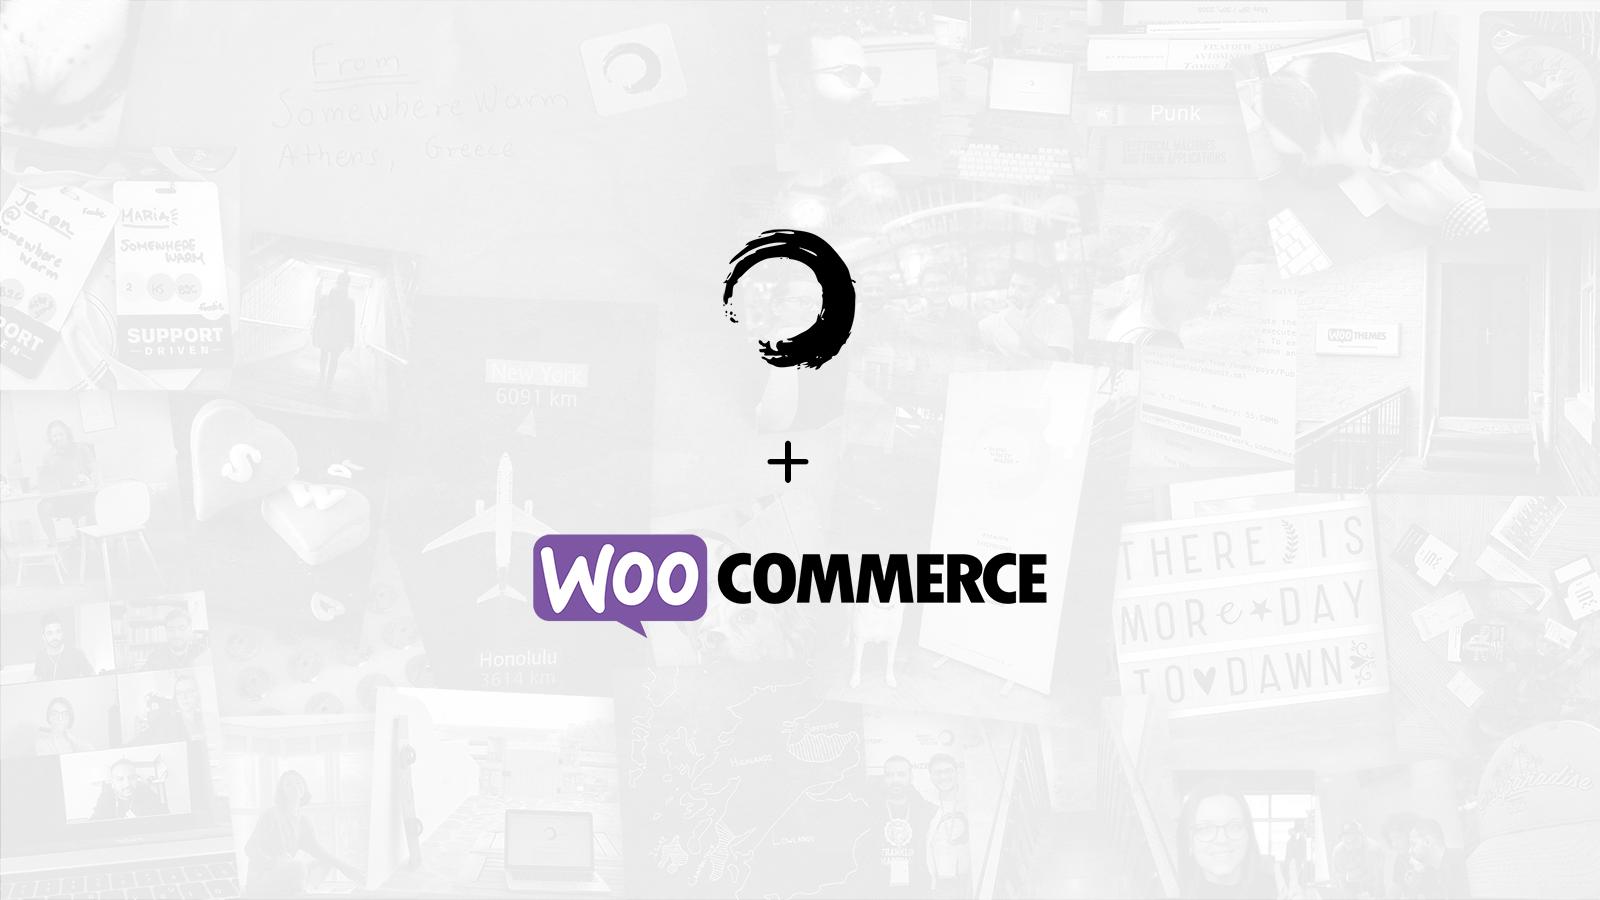 SomewhereWarm joins WooCommerce